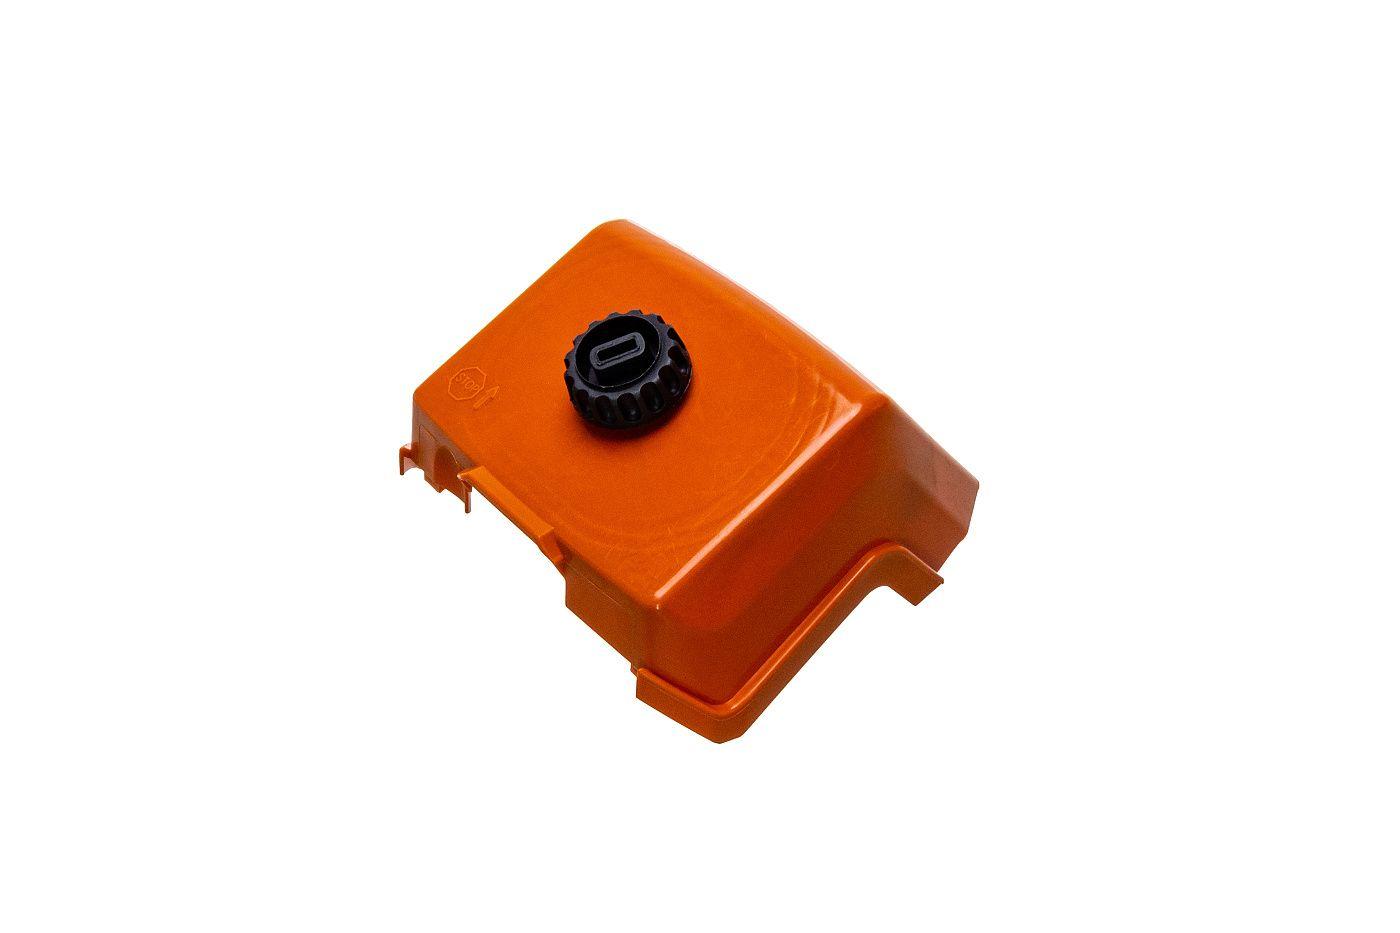 Kryt vzduchového filtra Stihl MS 440 044 - 1128 140 1003